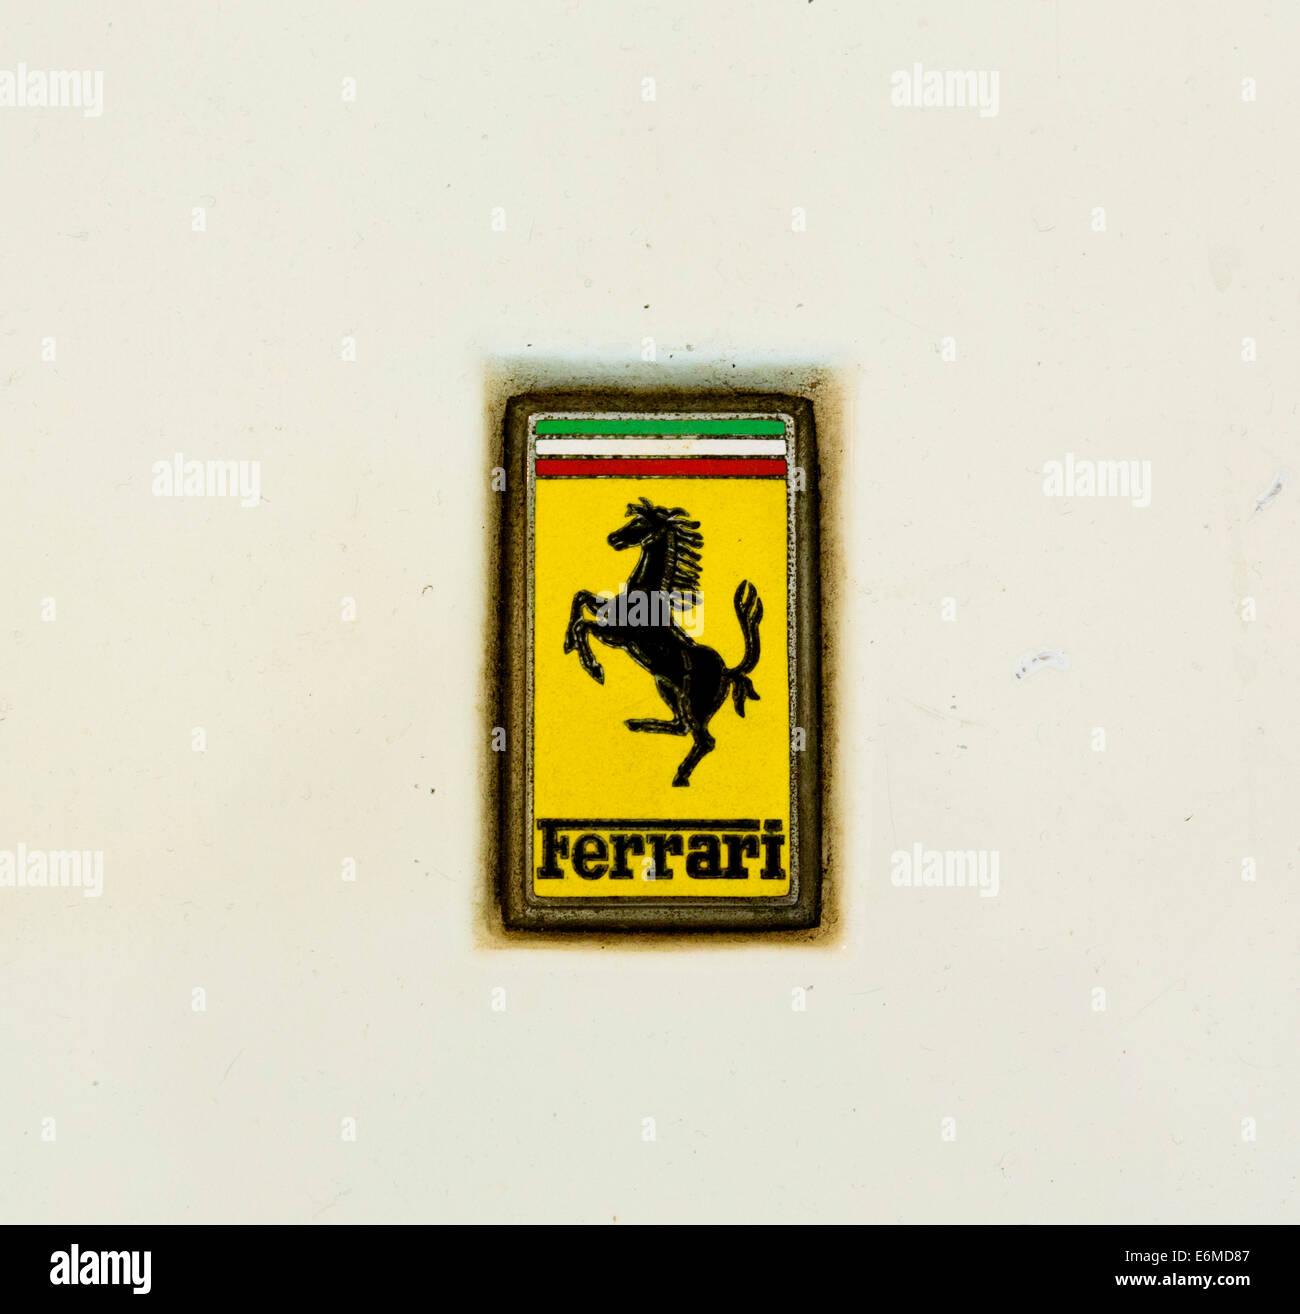 Ferrari badge on a racing car in the Museo Enzo Ferrari, Modena, Italy - Stock Image